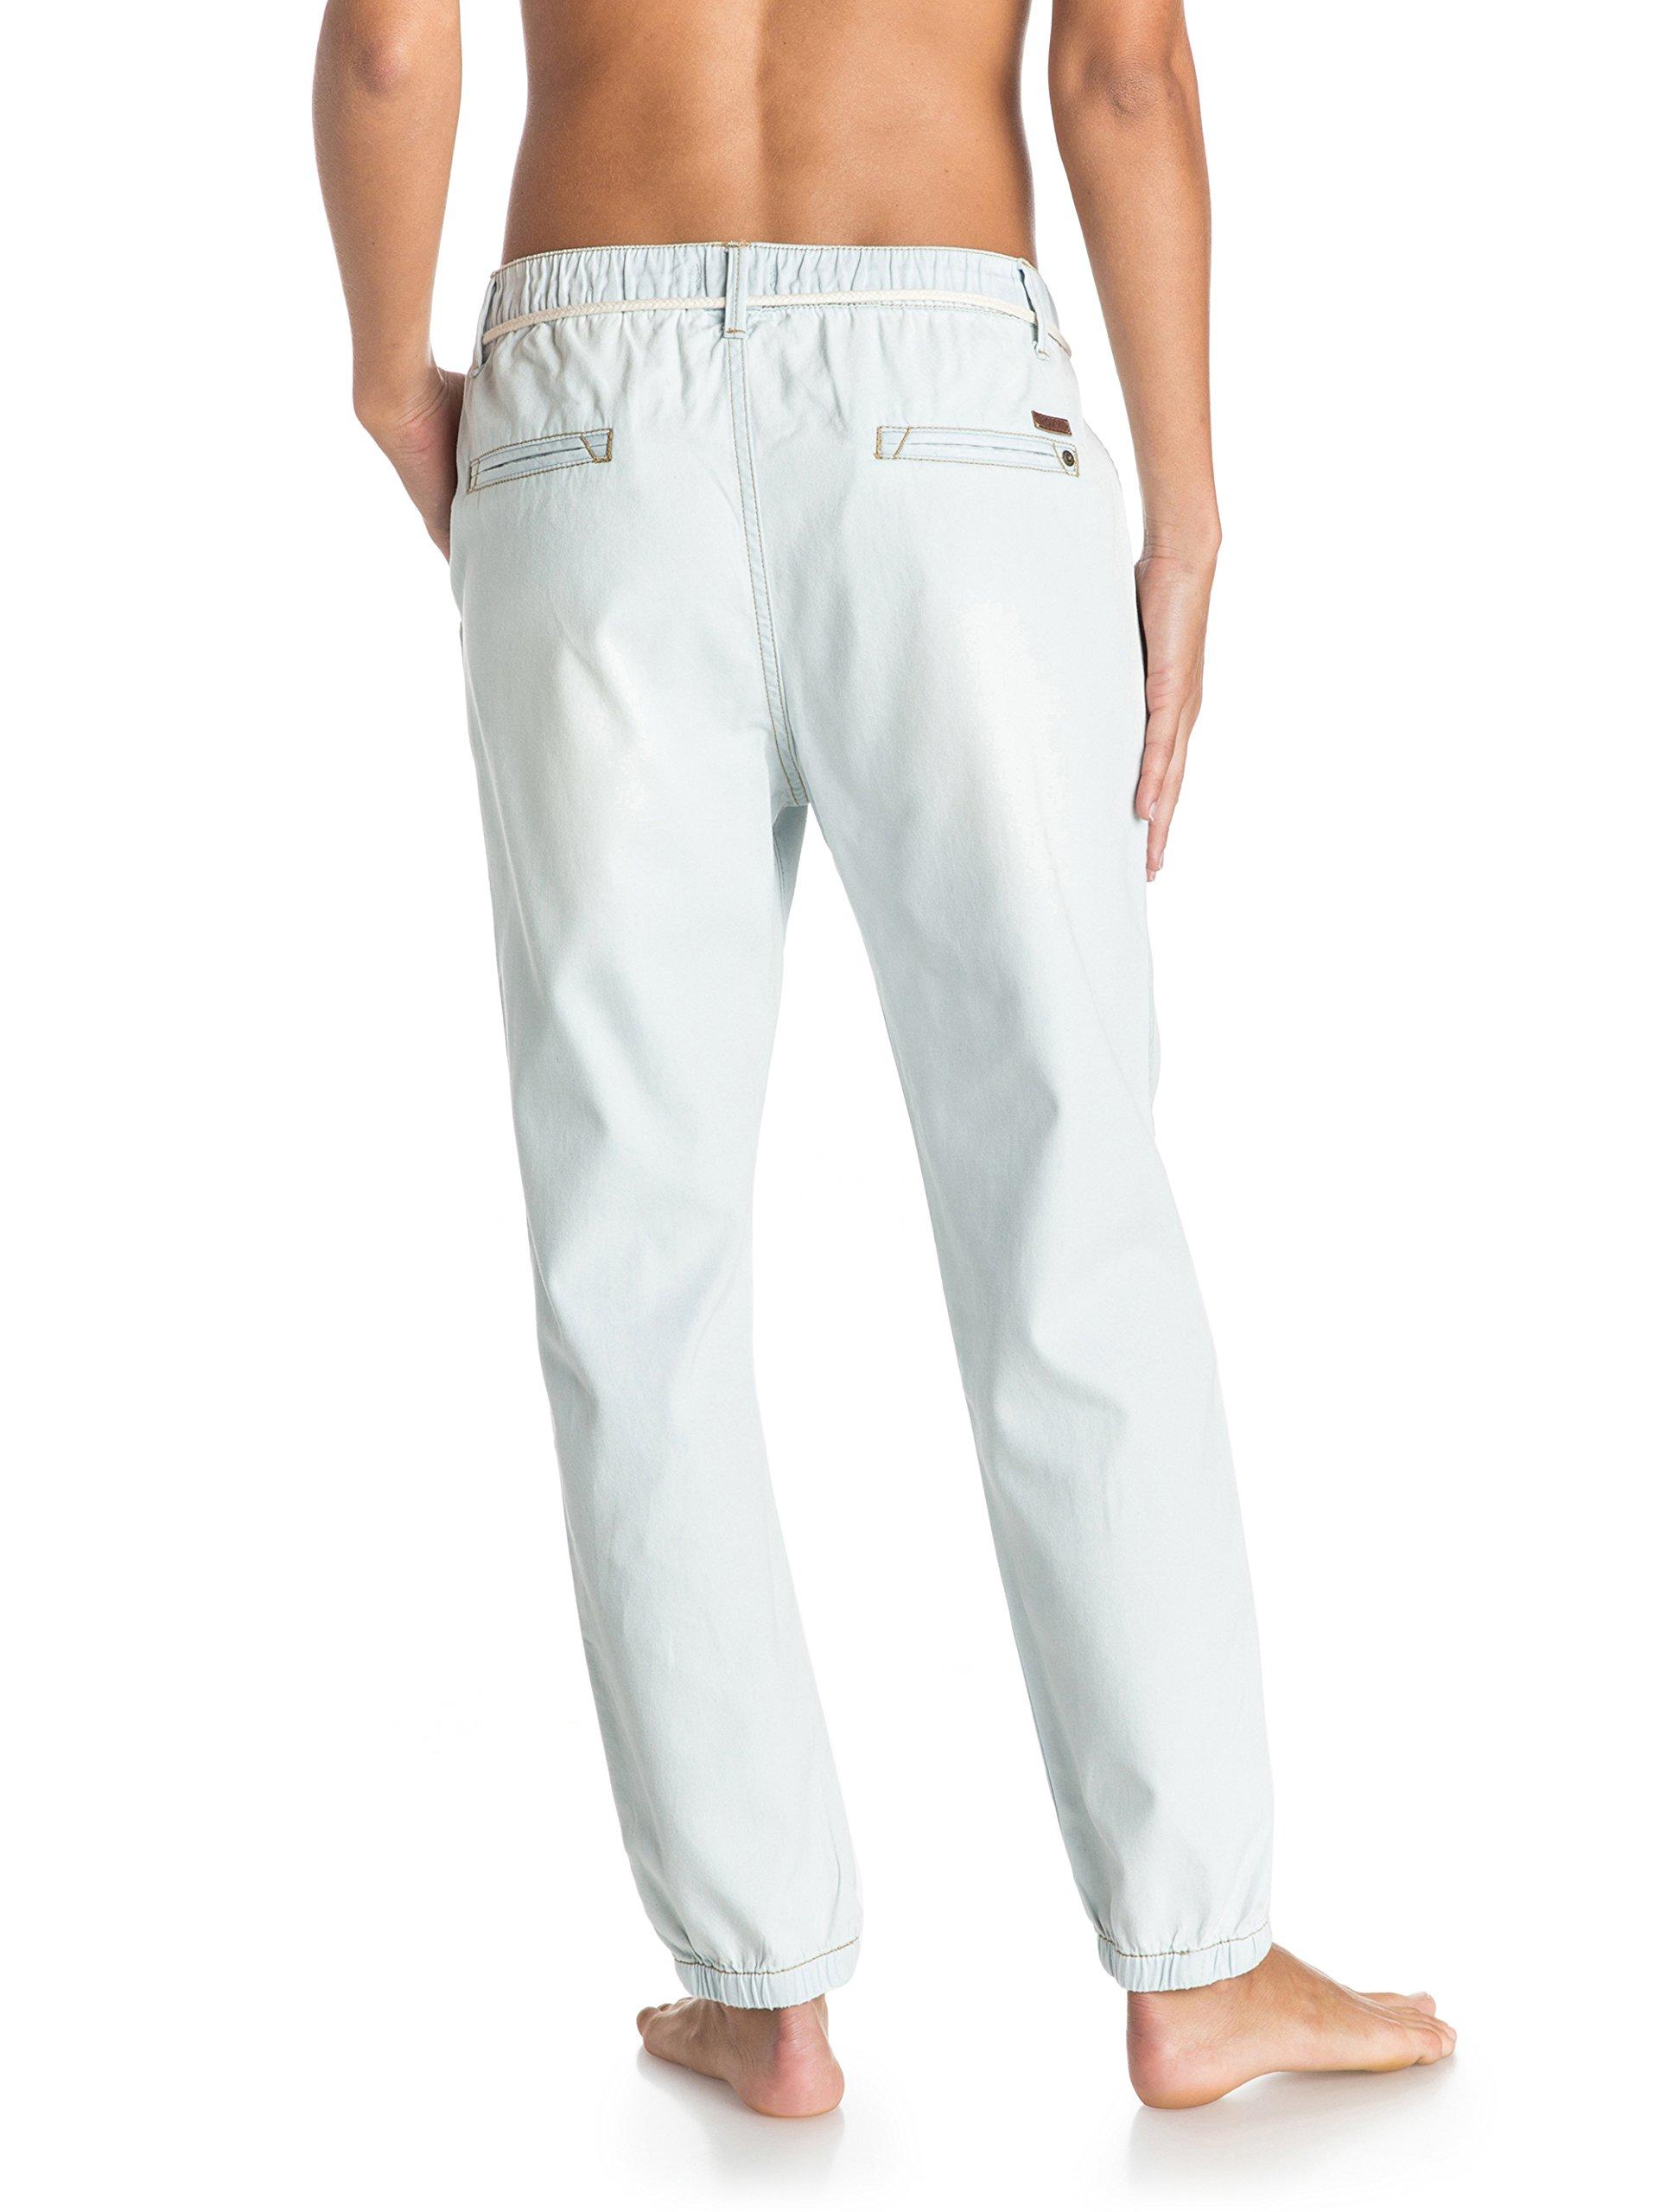 Roxy Hose Beachy Beach Dn J Pants – Pantalones. Mujer